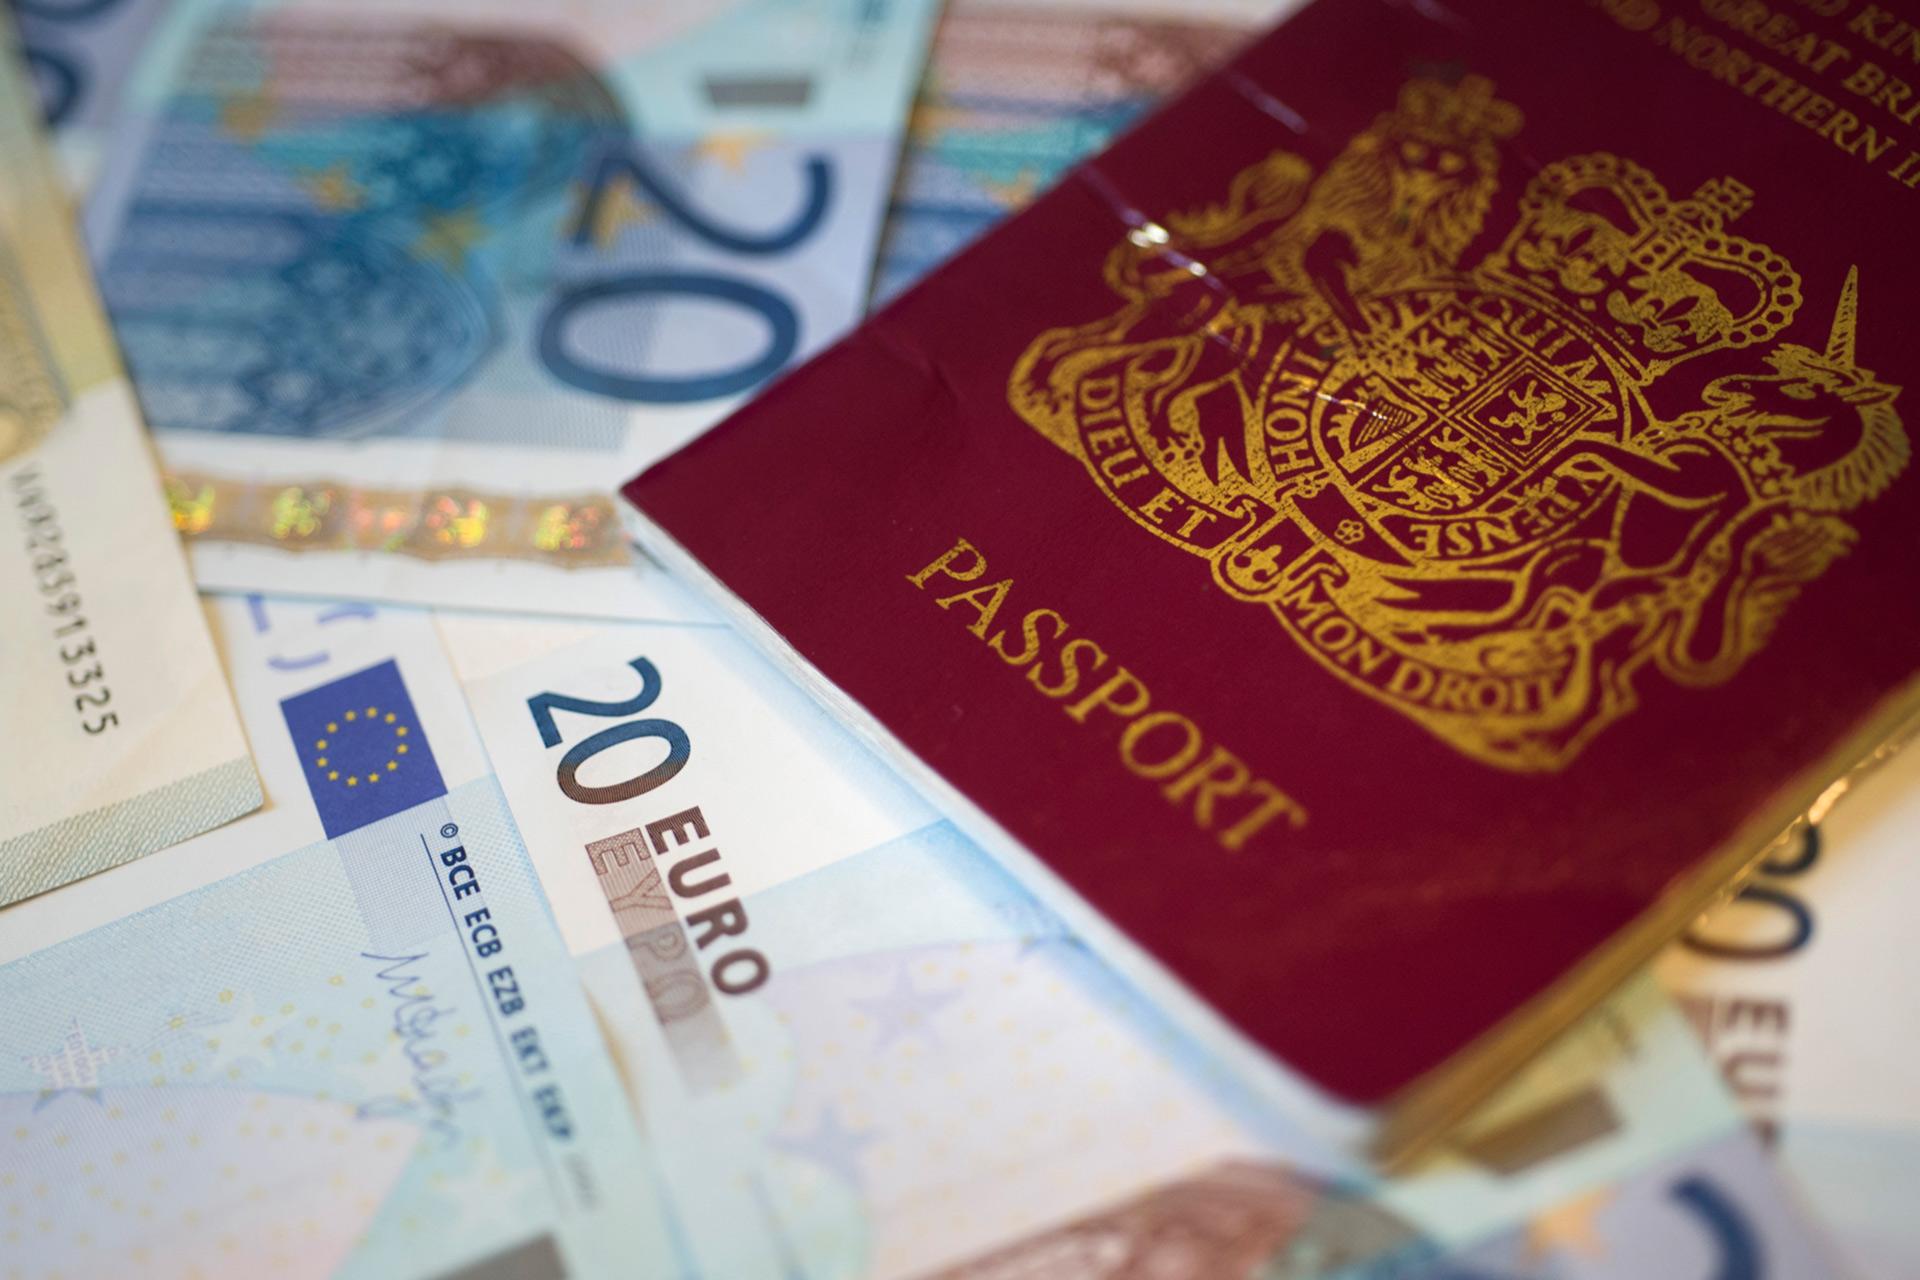 Passports visas customs visitscotland ccuart Choice Image